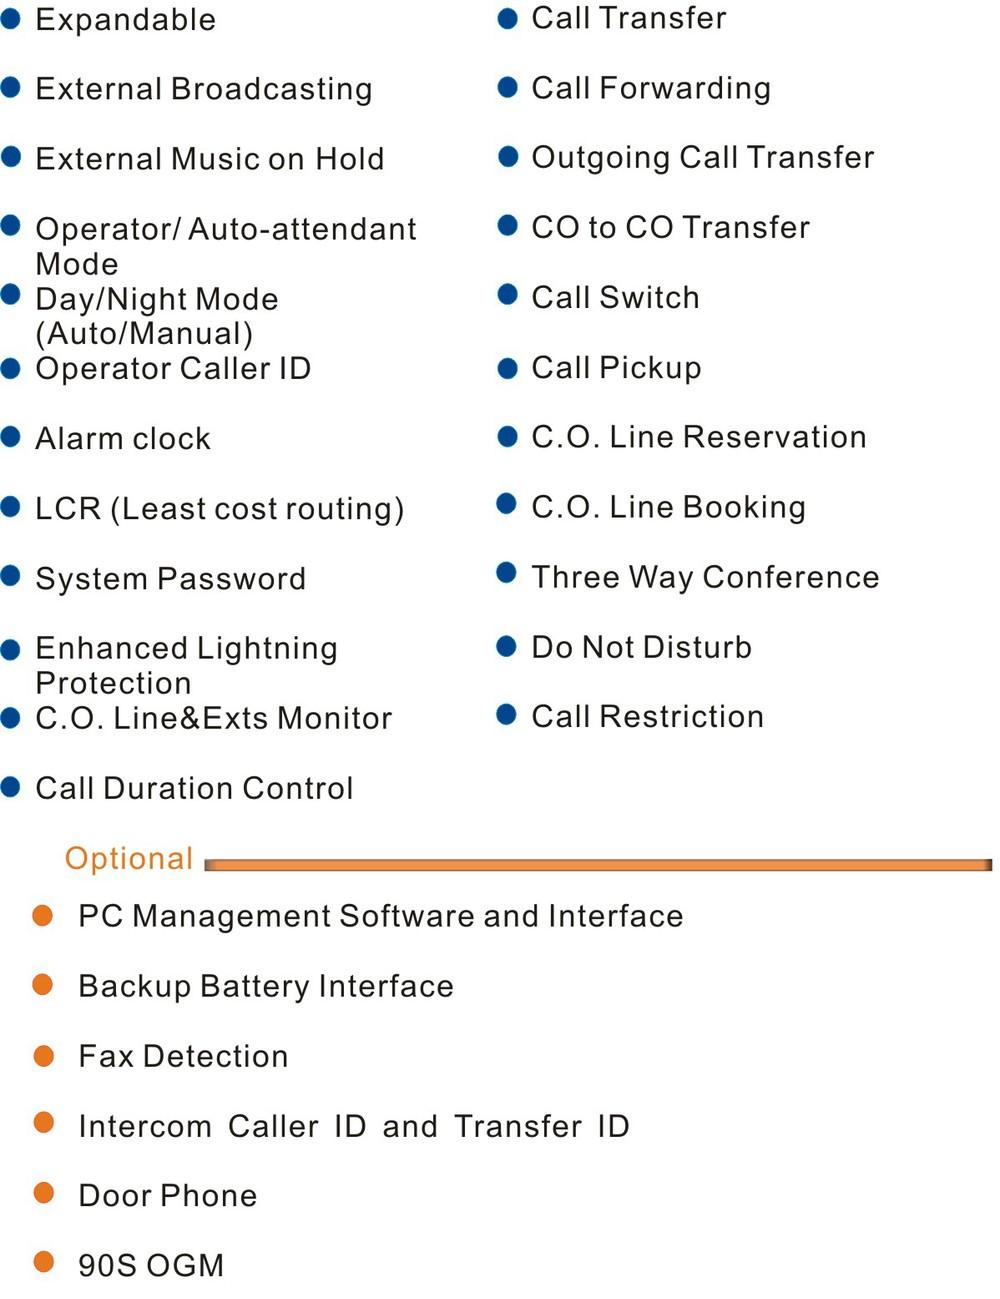 Excelltel /pabx/expandable Pbx/cp1696-416 4 Co Lines 16 Extensions ...